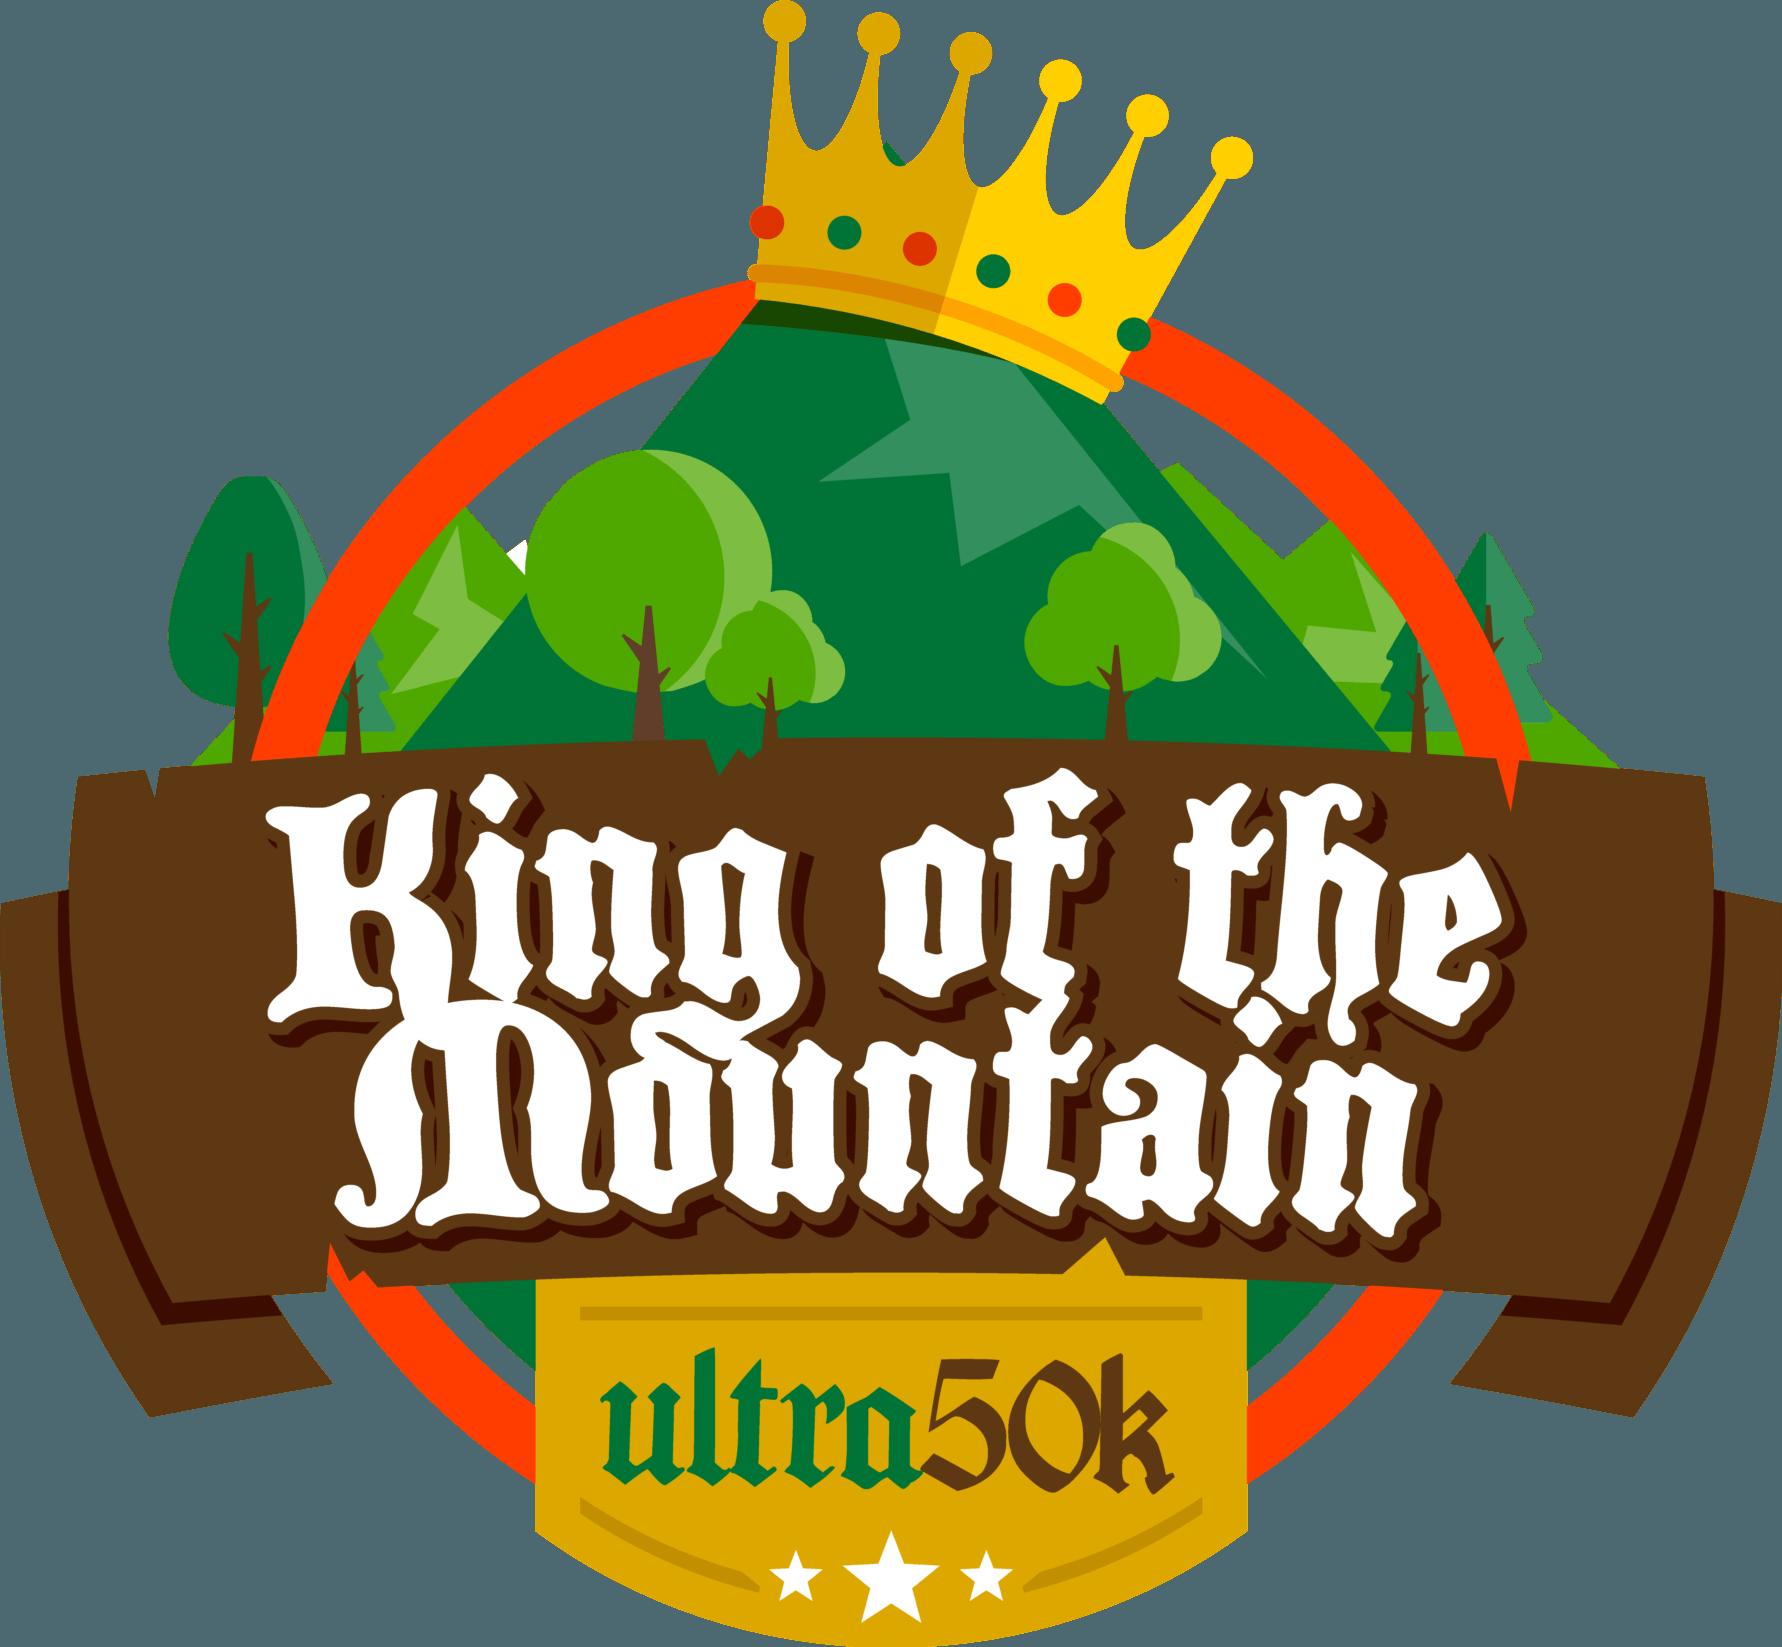 King of the k. Logo clipart mountain